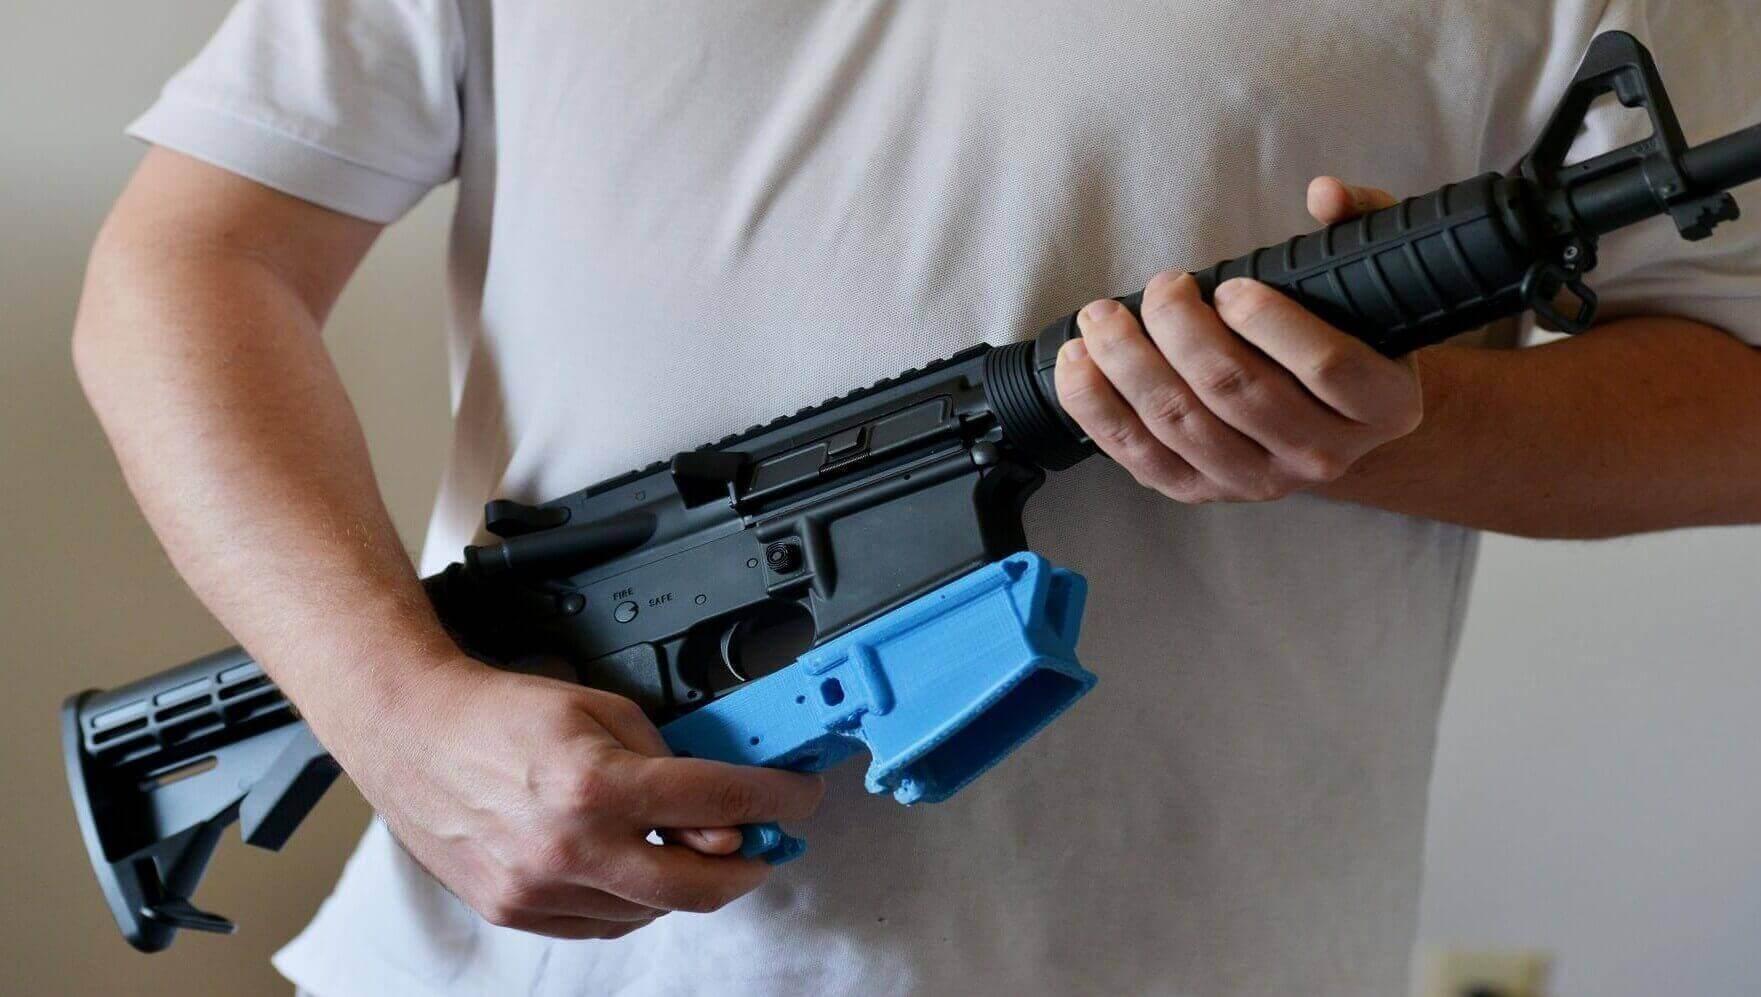 3D Printed Guns Finally A Reality